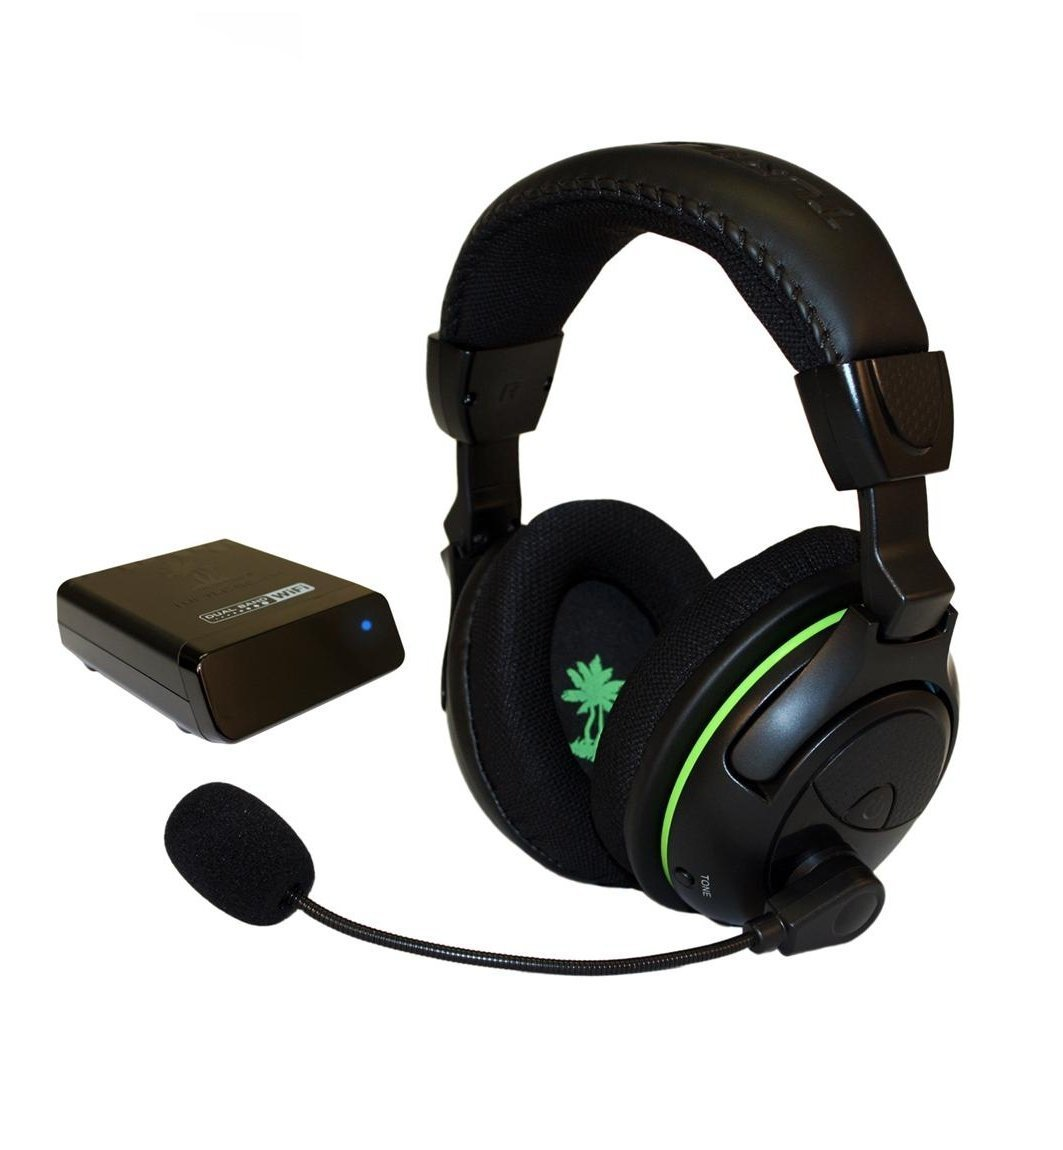 f4d26783c2e Amazon.com: Turtle Beach Ear Force X32 Digital Headset - Xbox 360  (Renewed): Computers & Accessories